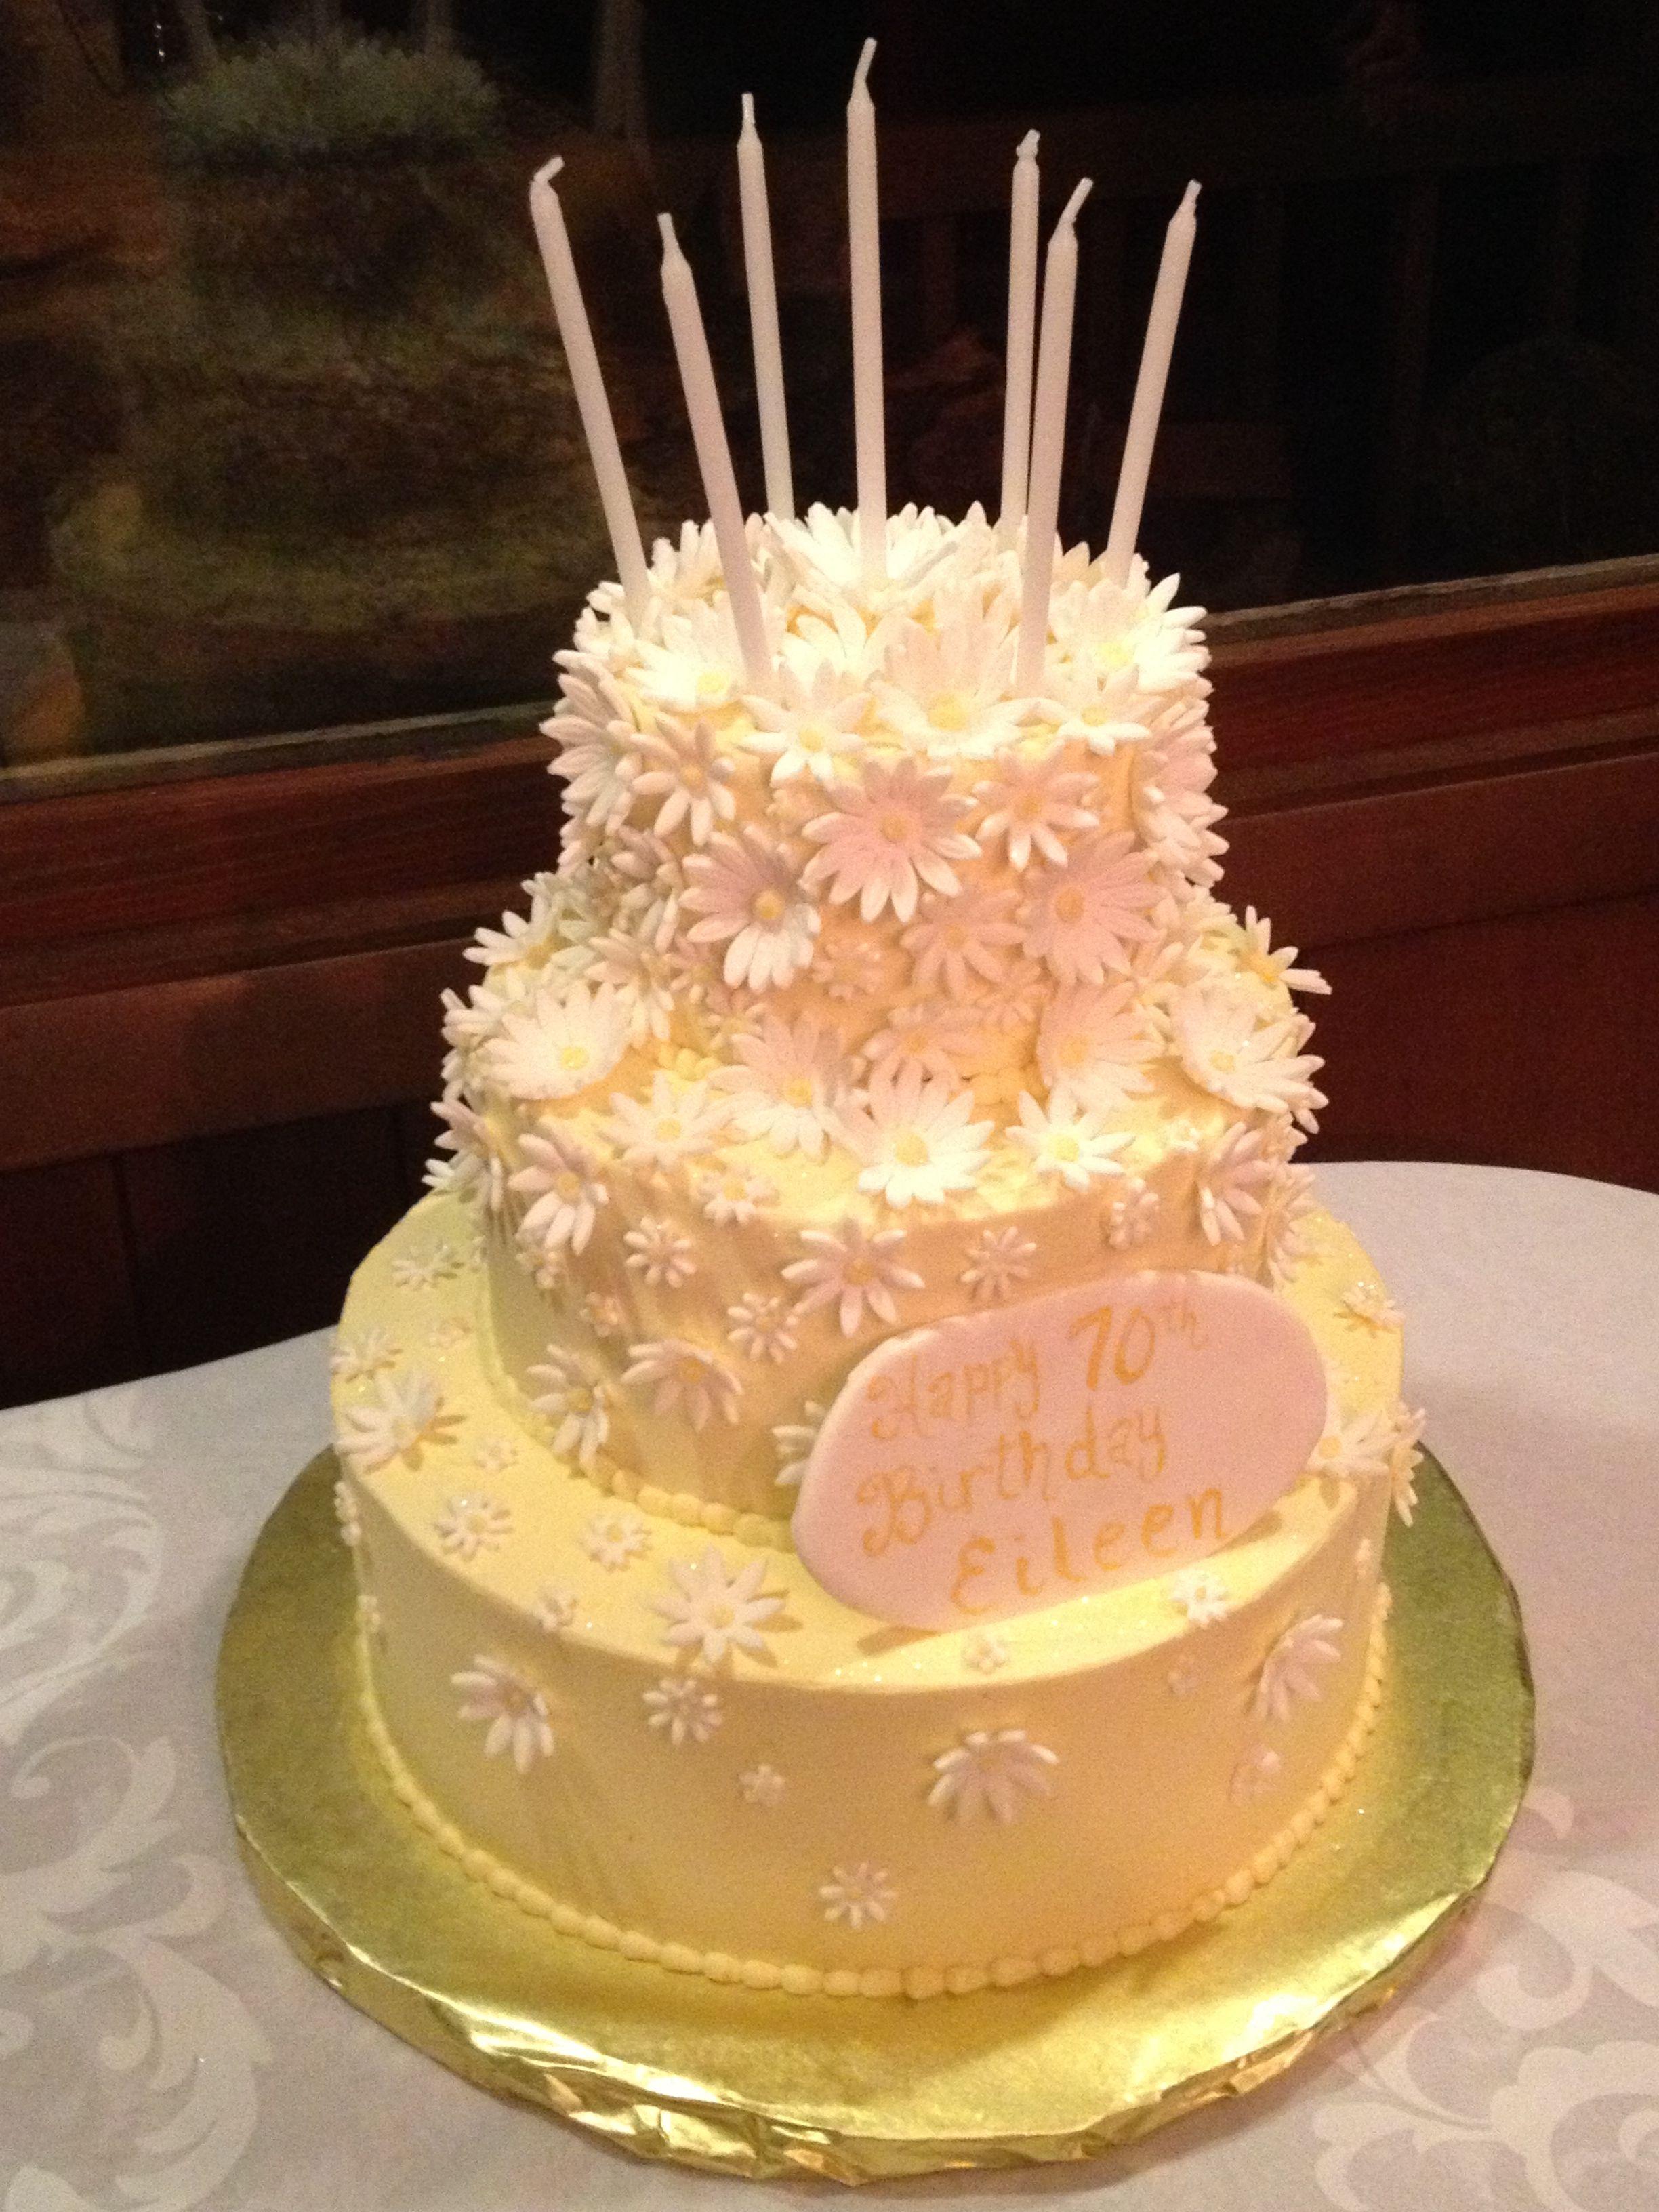 Cake For Moms 70th Birthday